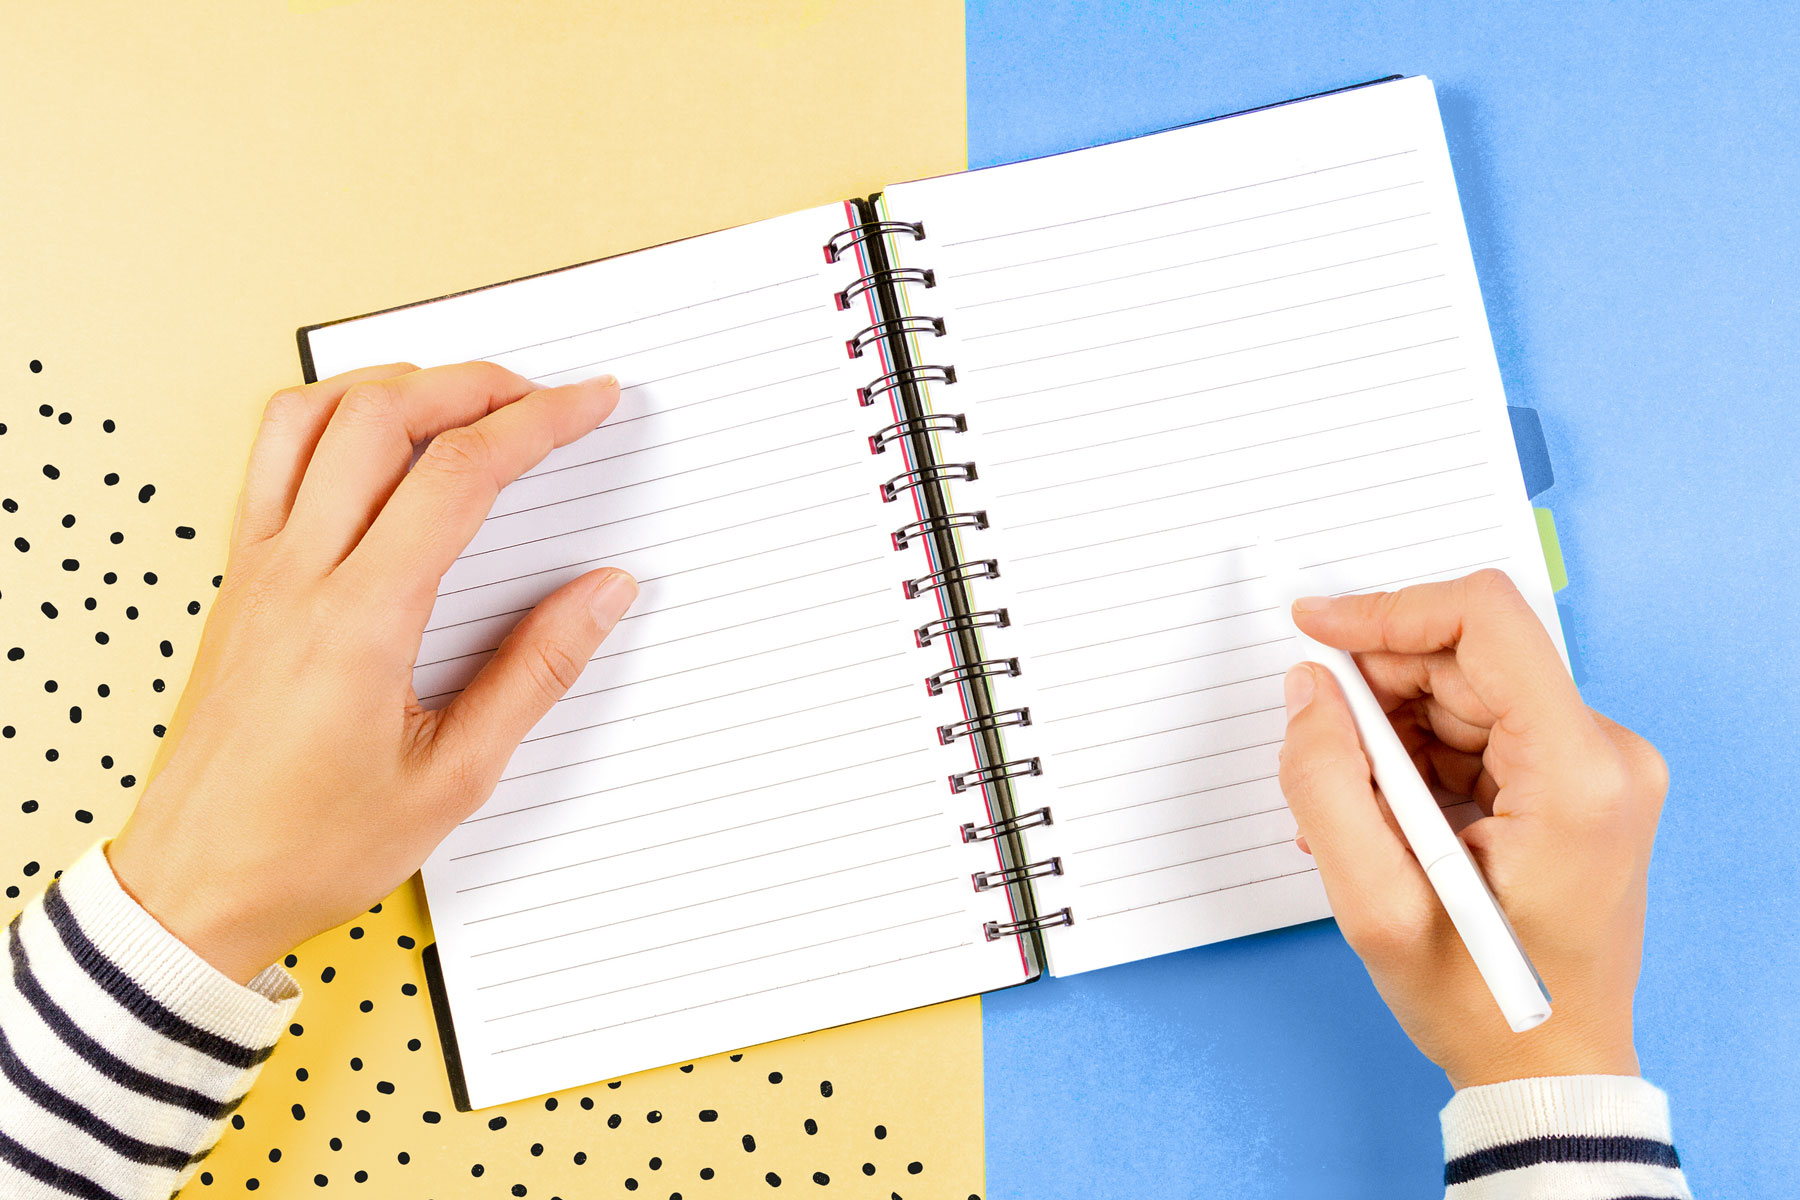 training_creatives_hand-writing_behaviour_design.jpg